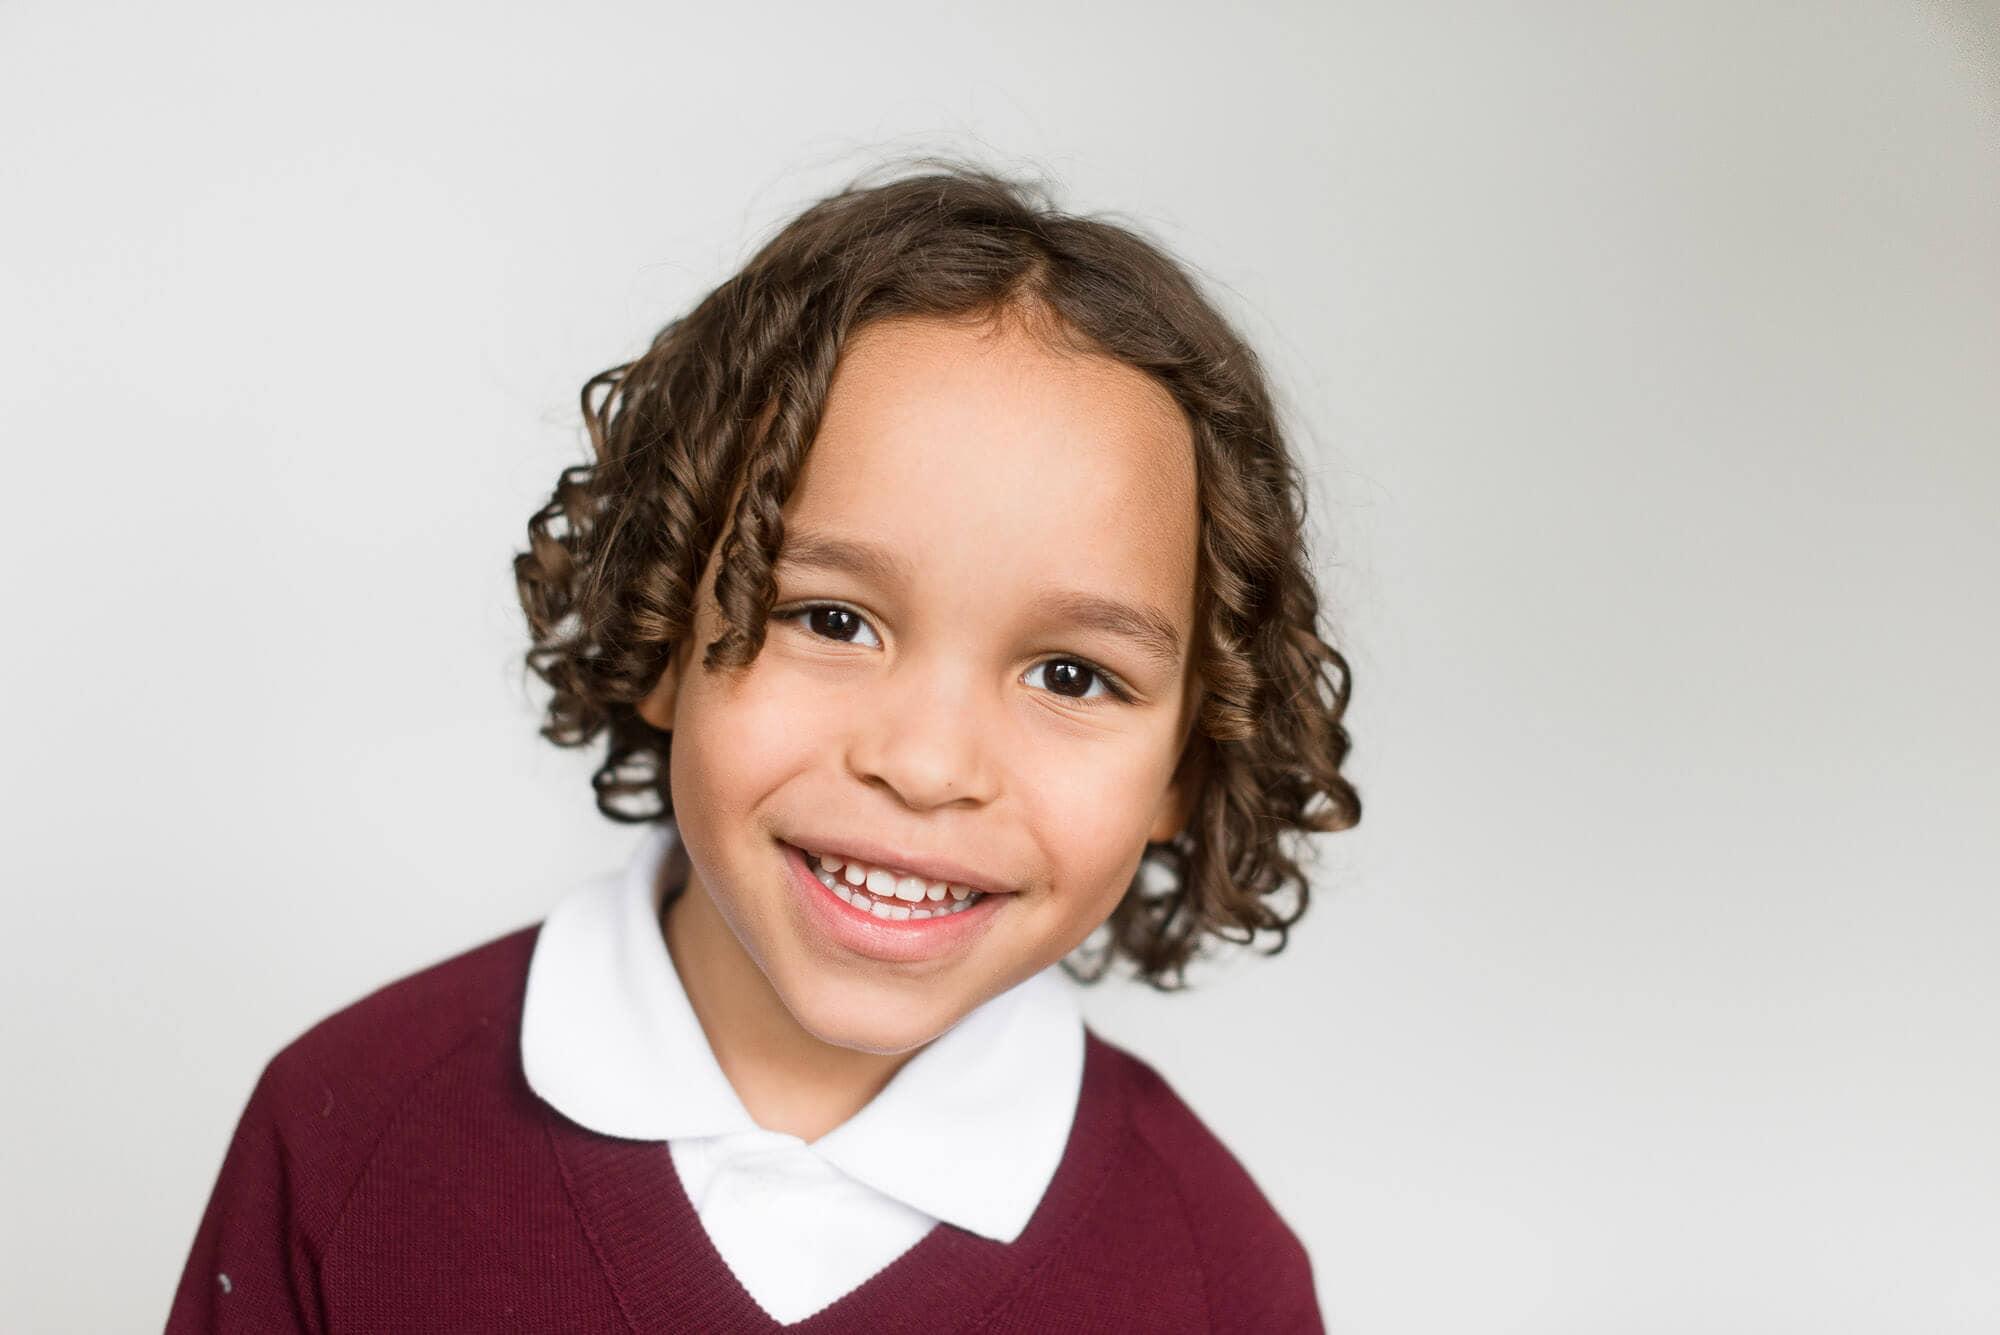 fine art school photography boy with curly hair